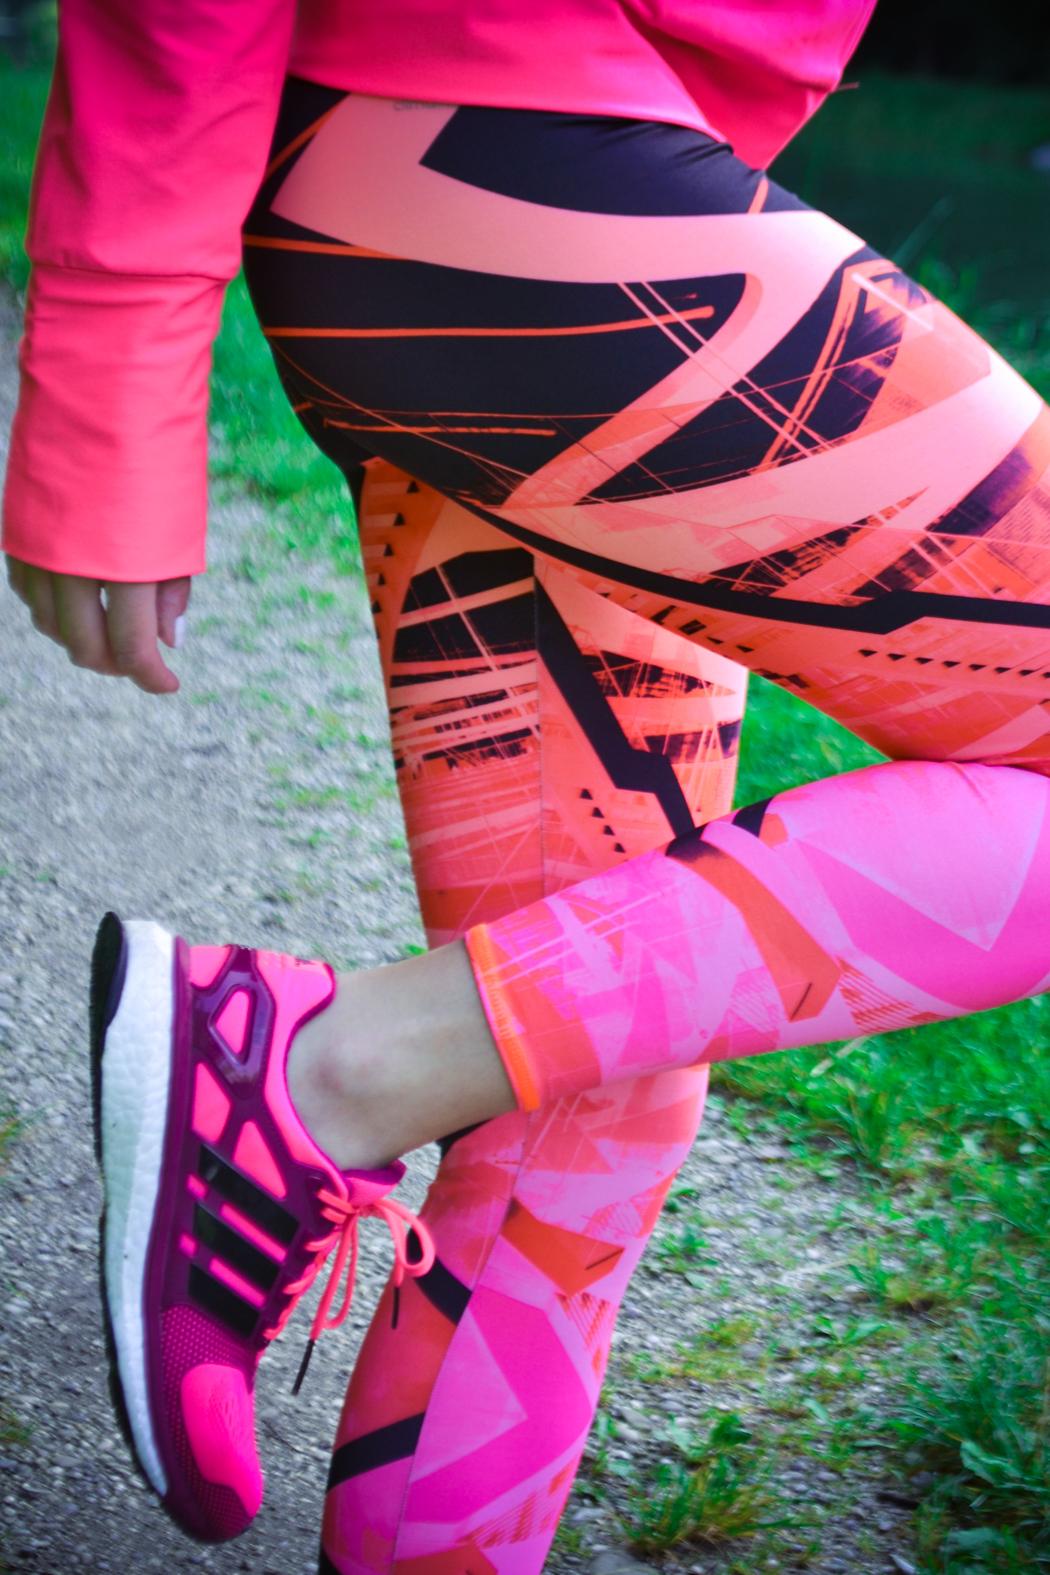 Lindarella-Fitnessblogger-Munich-München-Adidas-Boost-Laufschuhe-Pink-Sportoutfit-3